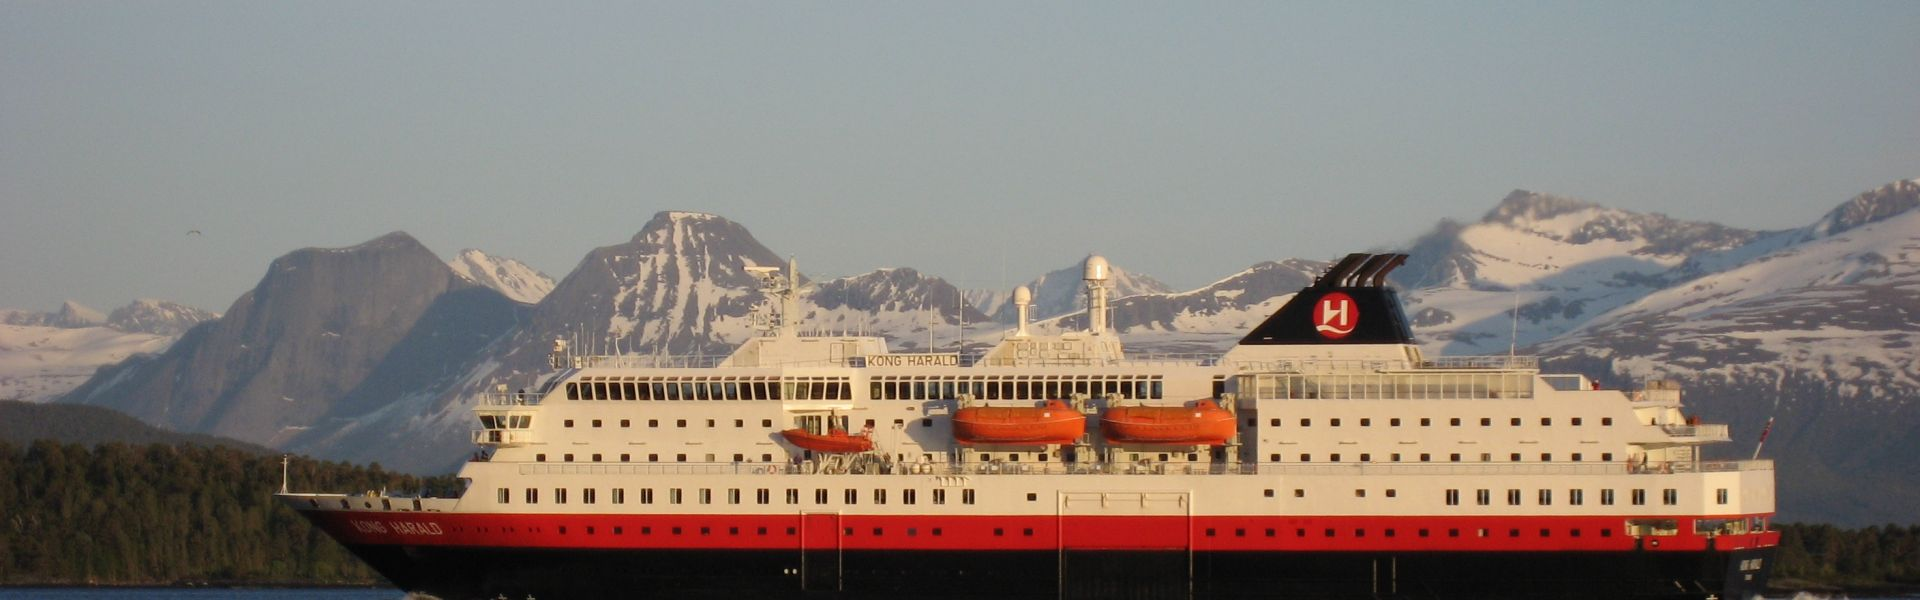 Croaziera 2017 - Scandinavia si Fiordurile Norvegiene (Kirkenes) - Hurtigruten - MS Kong Harald - 5 nopti